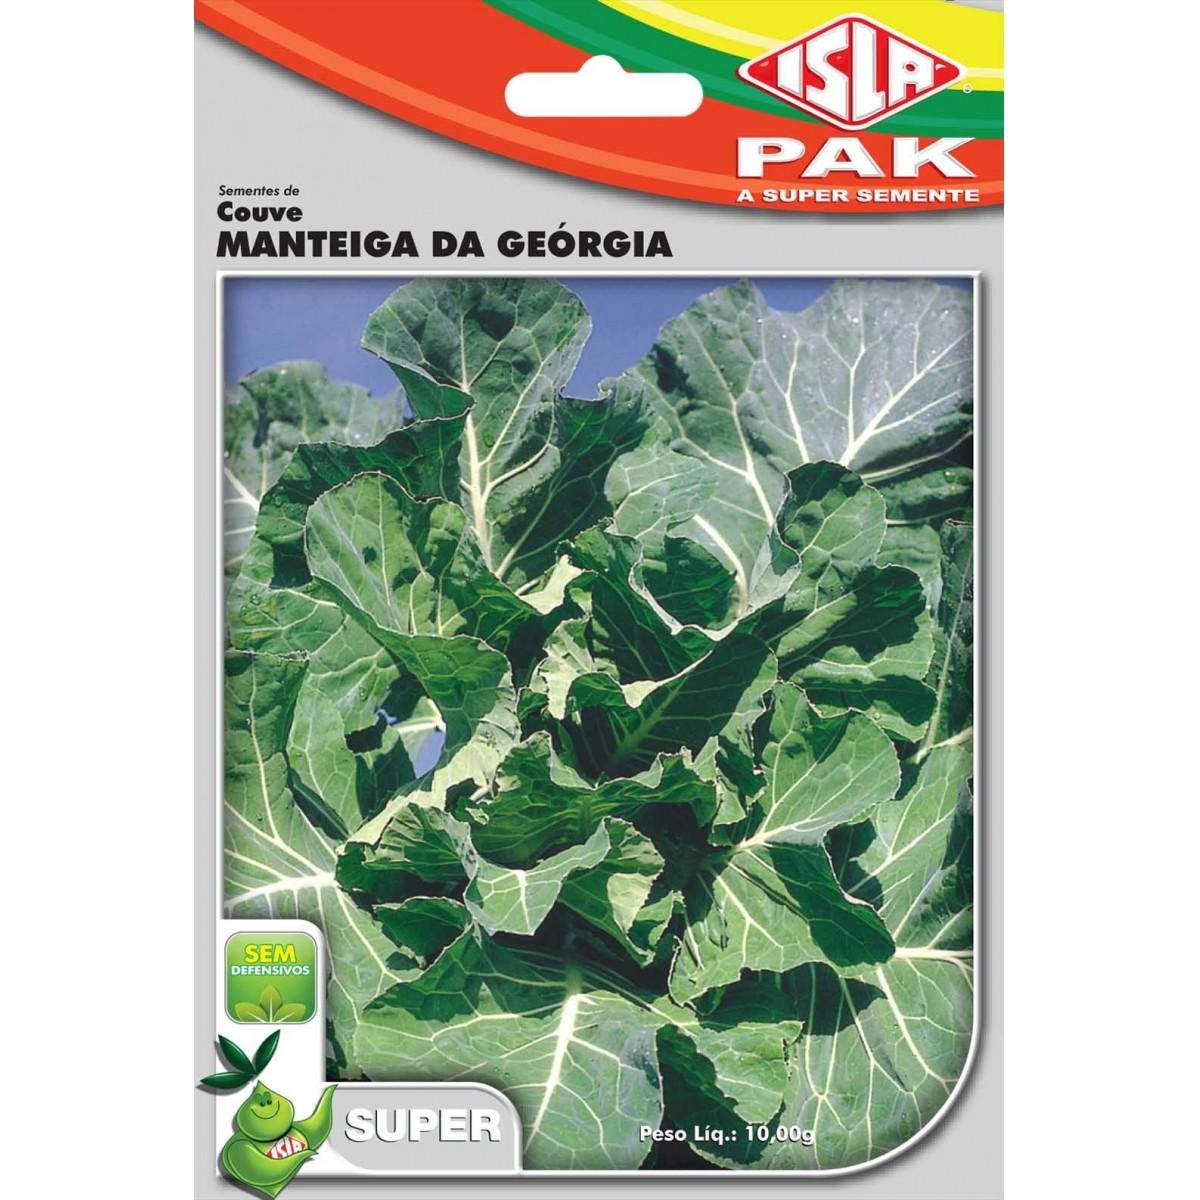 Sementes de Couve Manteiga da Geórgia - Isla Superpak